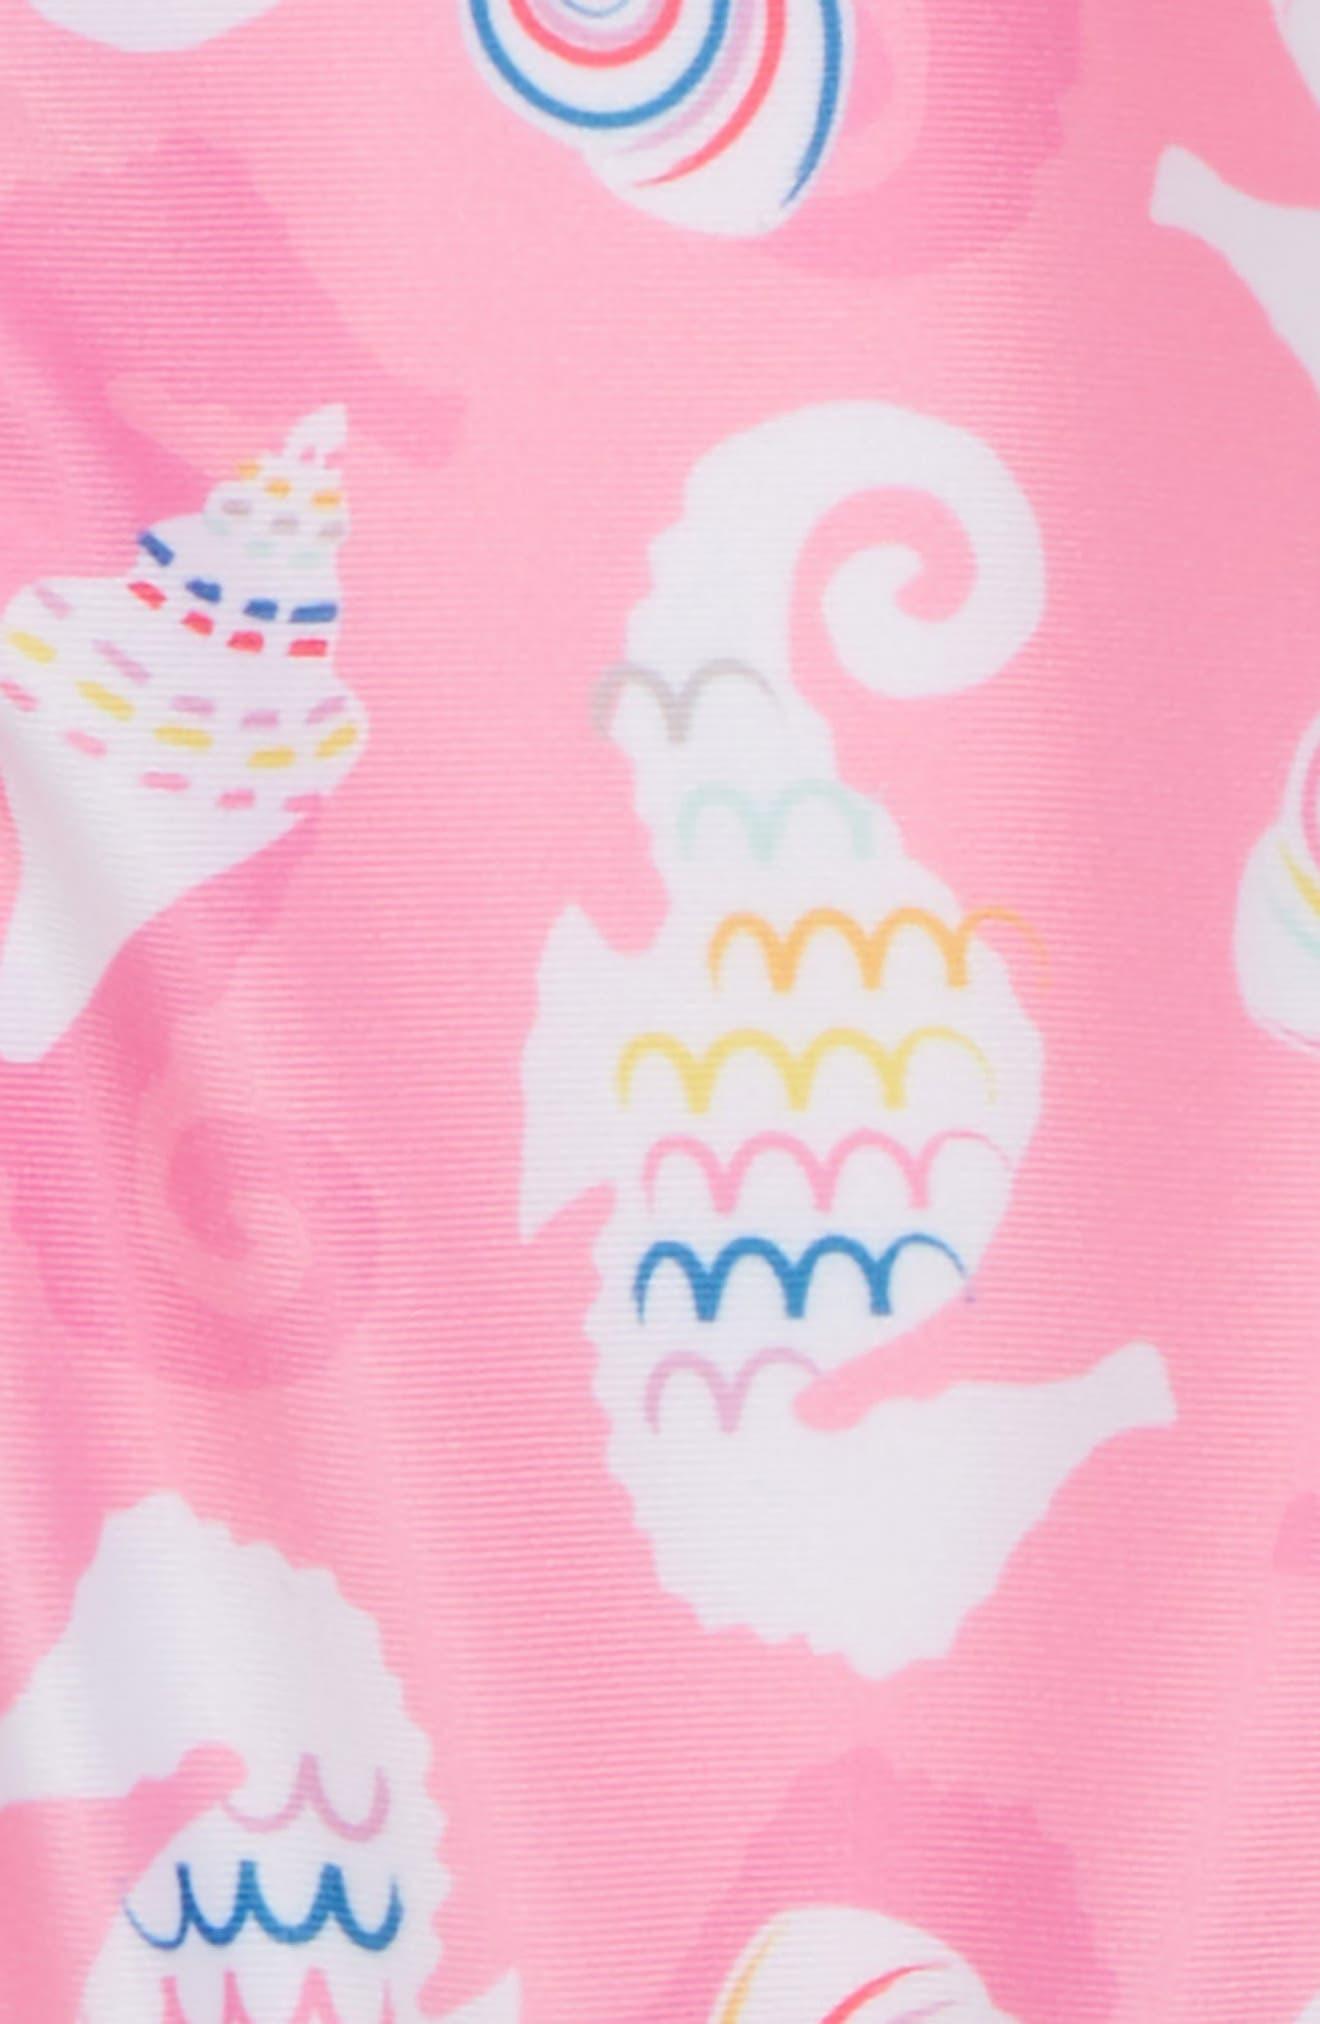 Seahorse/Shells One-Piece Short Sleeve Rashguard Swimsuit,                             Alternate thumbnail 2, color,                             Pink